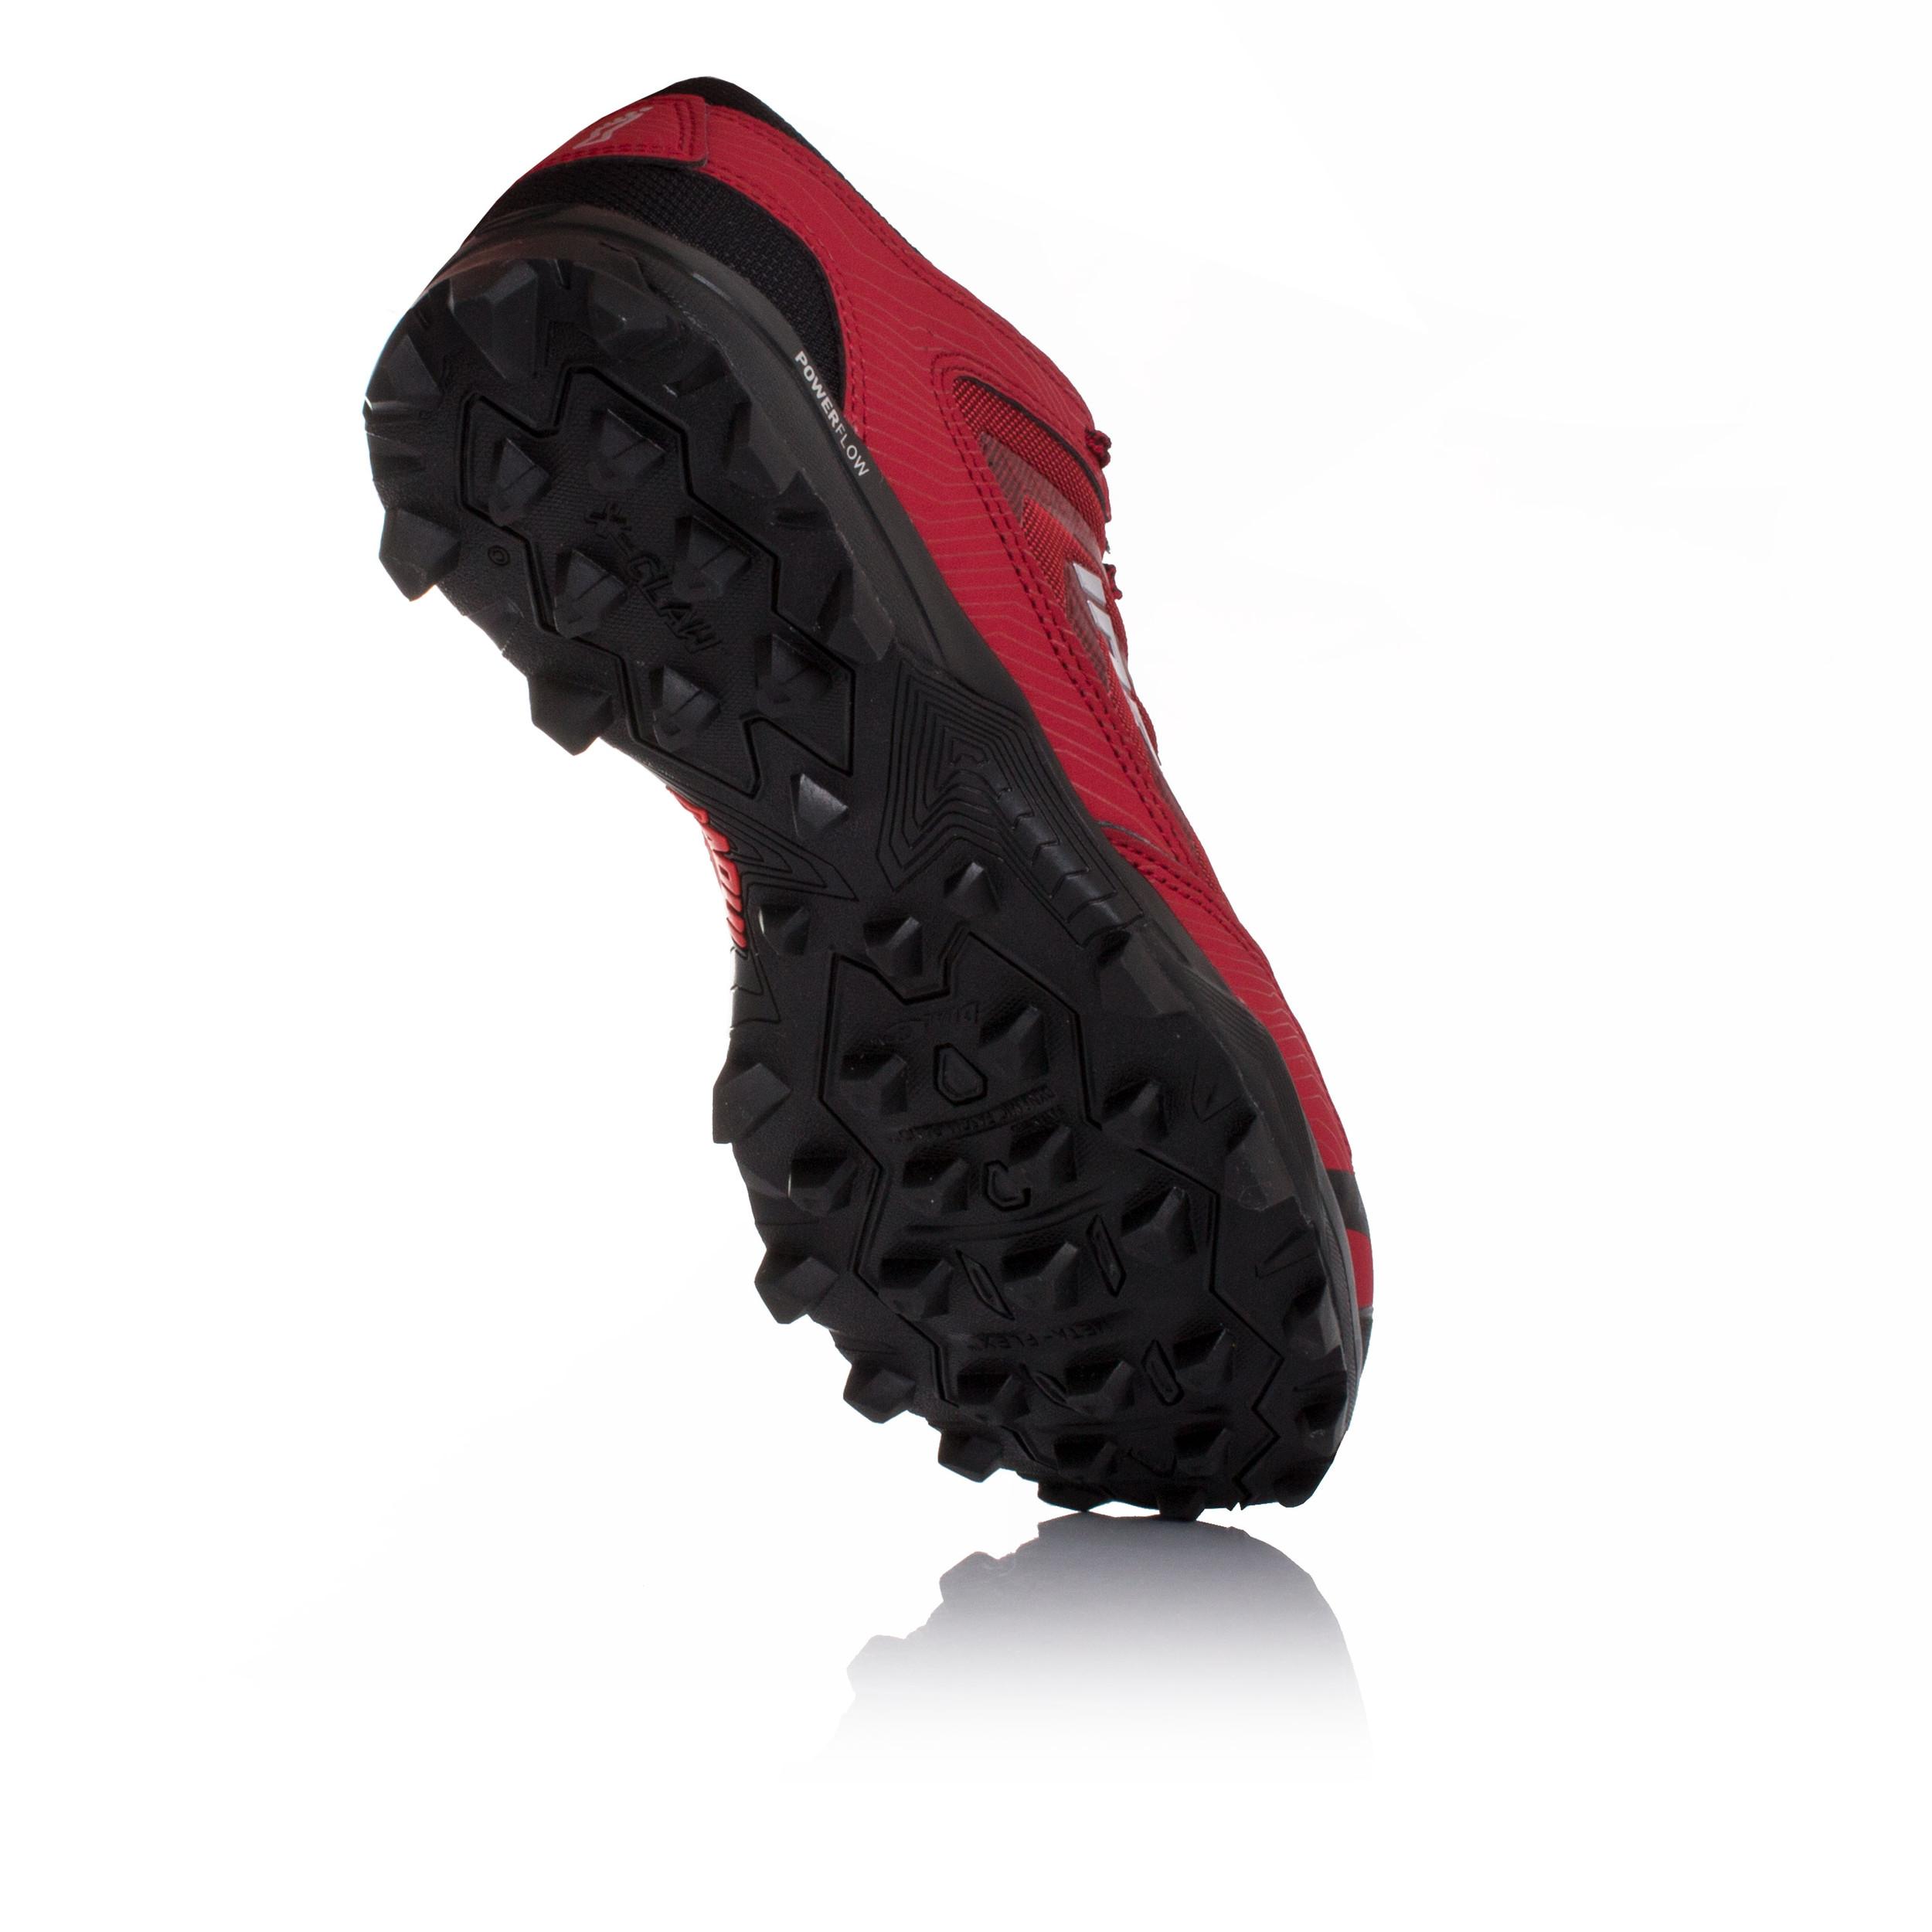 Details Claw Zu Laufschuhe Sport Turnschuhe Inov8 X 275 Trail Schuhe Rot Schwarz Herren lF1cJK